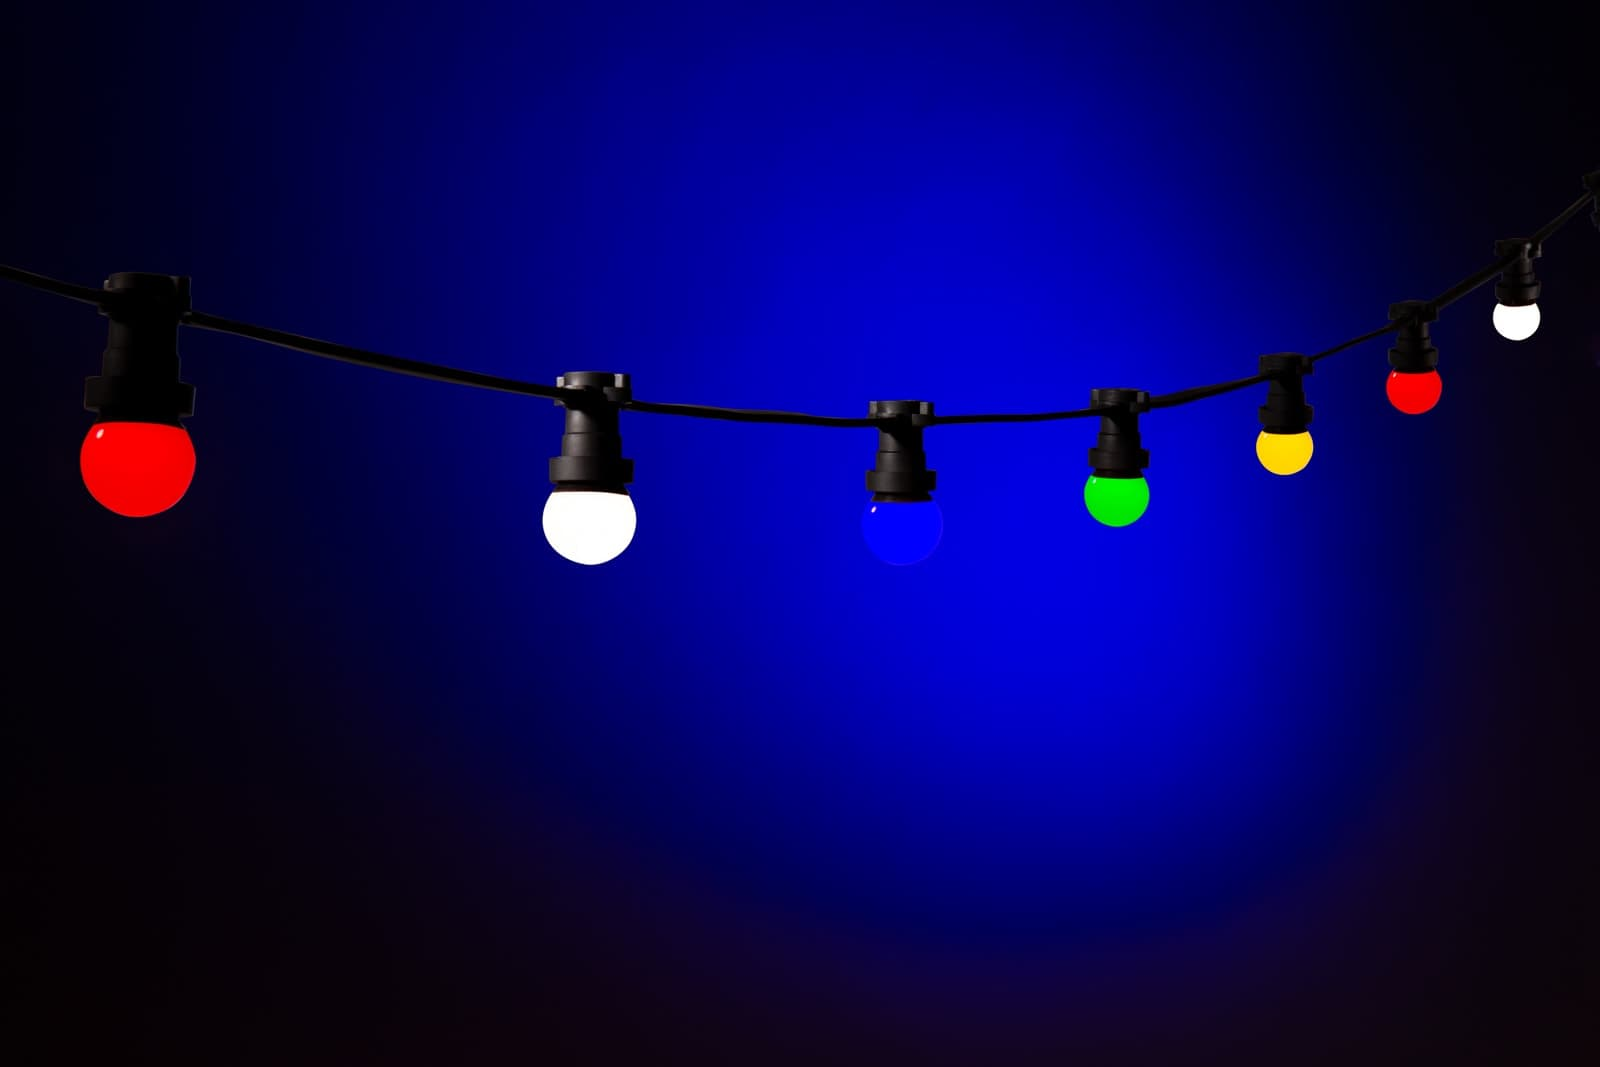 Gekleurde Led Lampen : Gekleurde lampen multicolor bolletjes · koppelbaar systeem handig